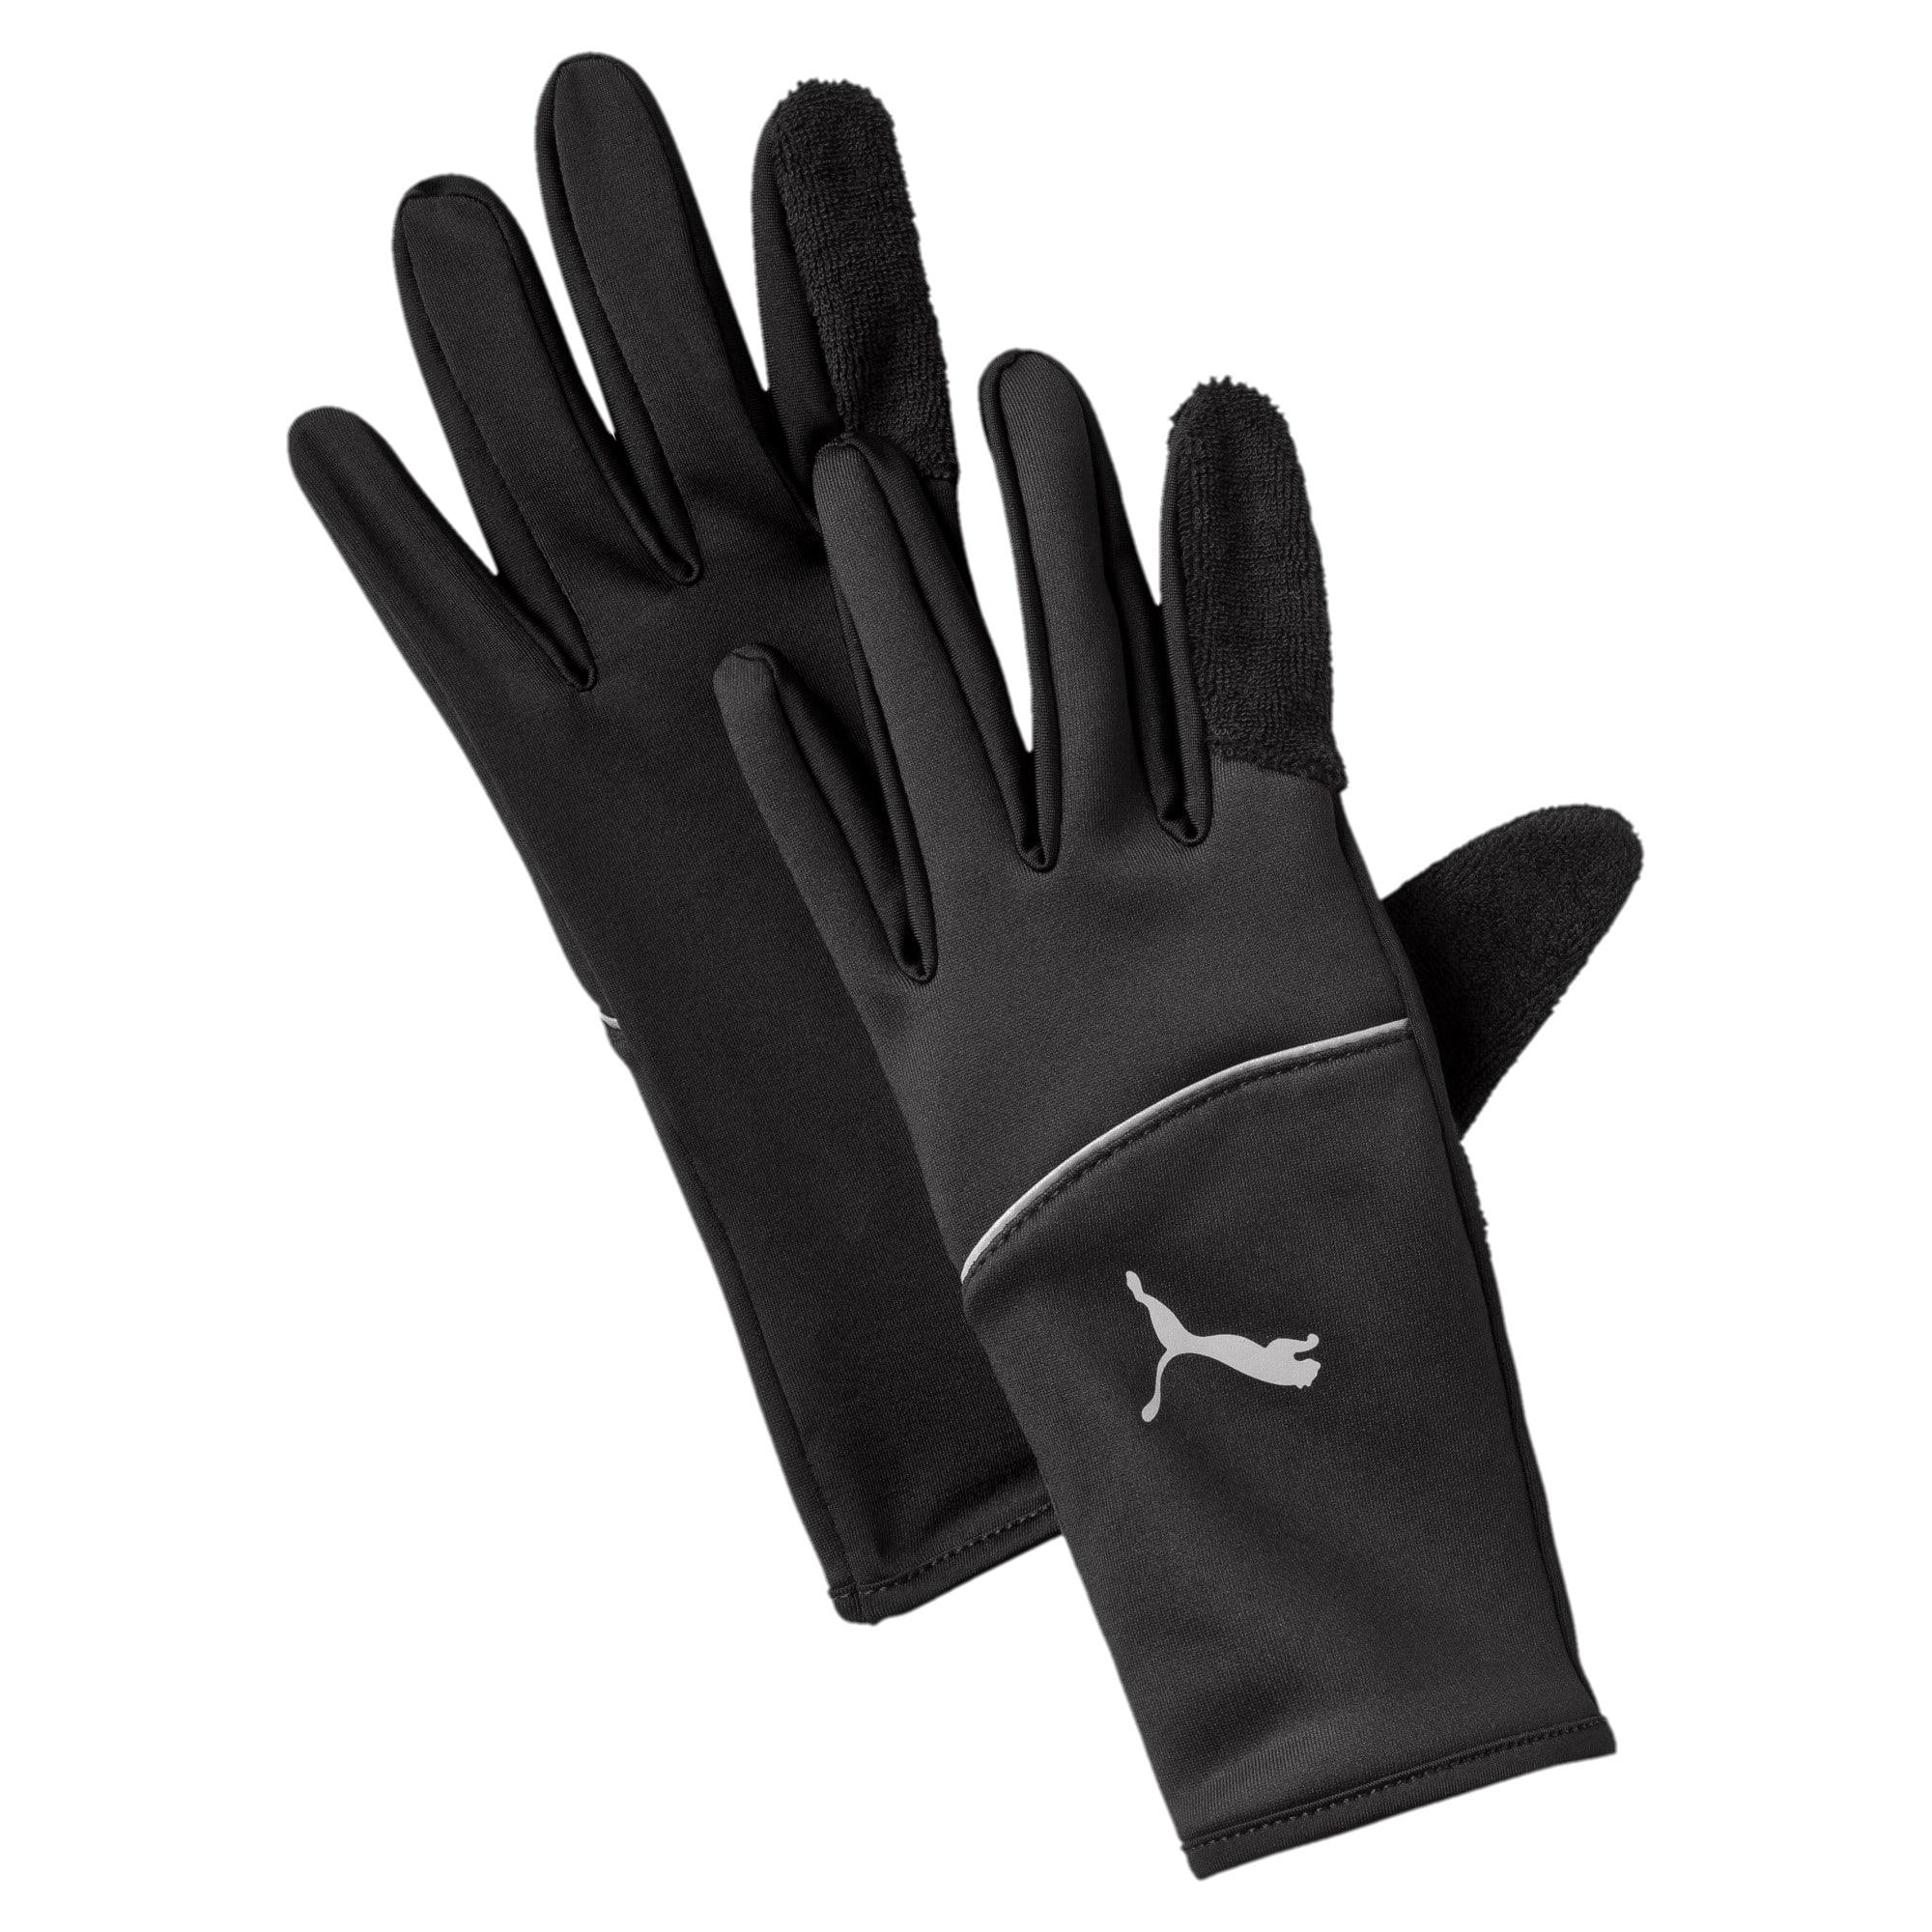 Thumbnail 1 of PR Thermo Gloves, Puma Black, medium-IND